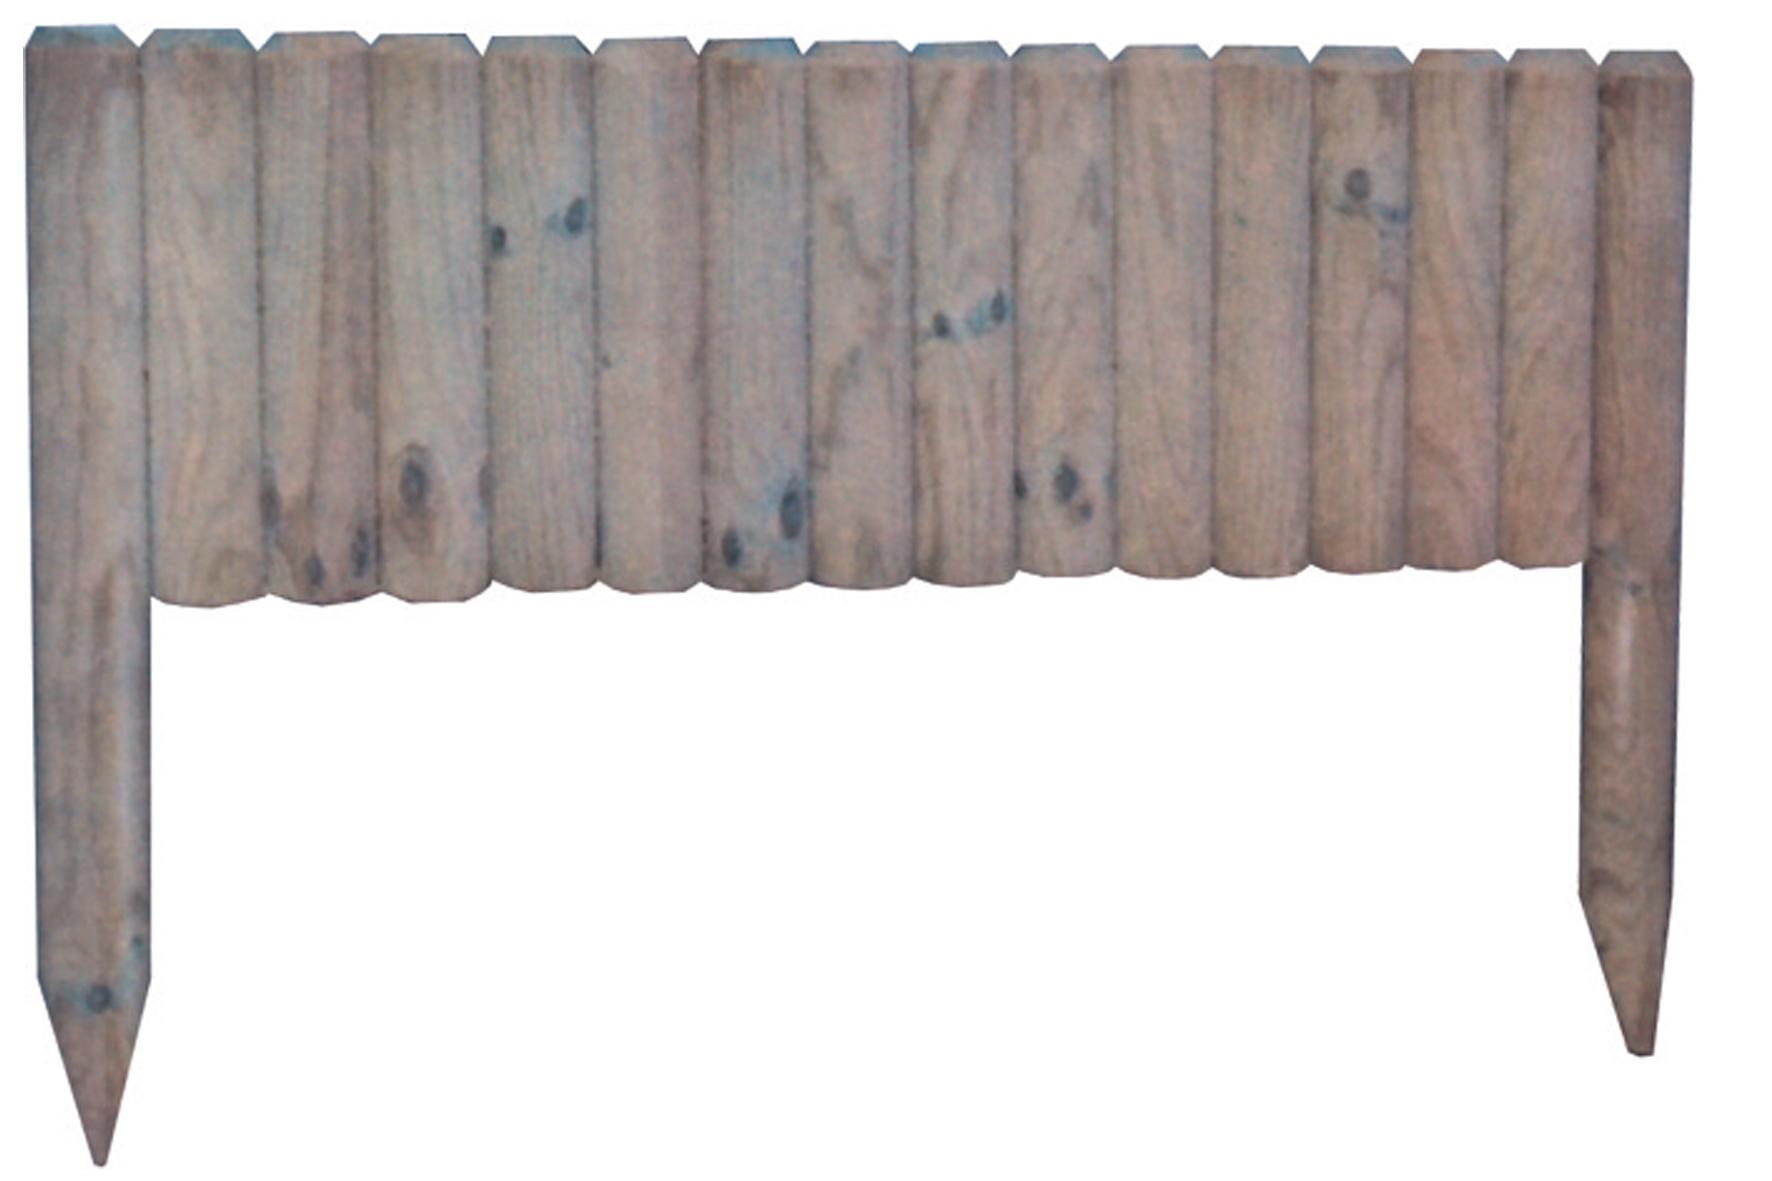 Bordure sapin rigide demi rond bordure sapin rigide demi rond